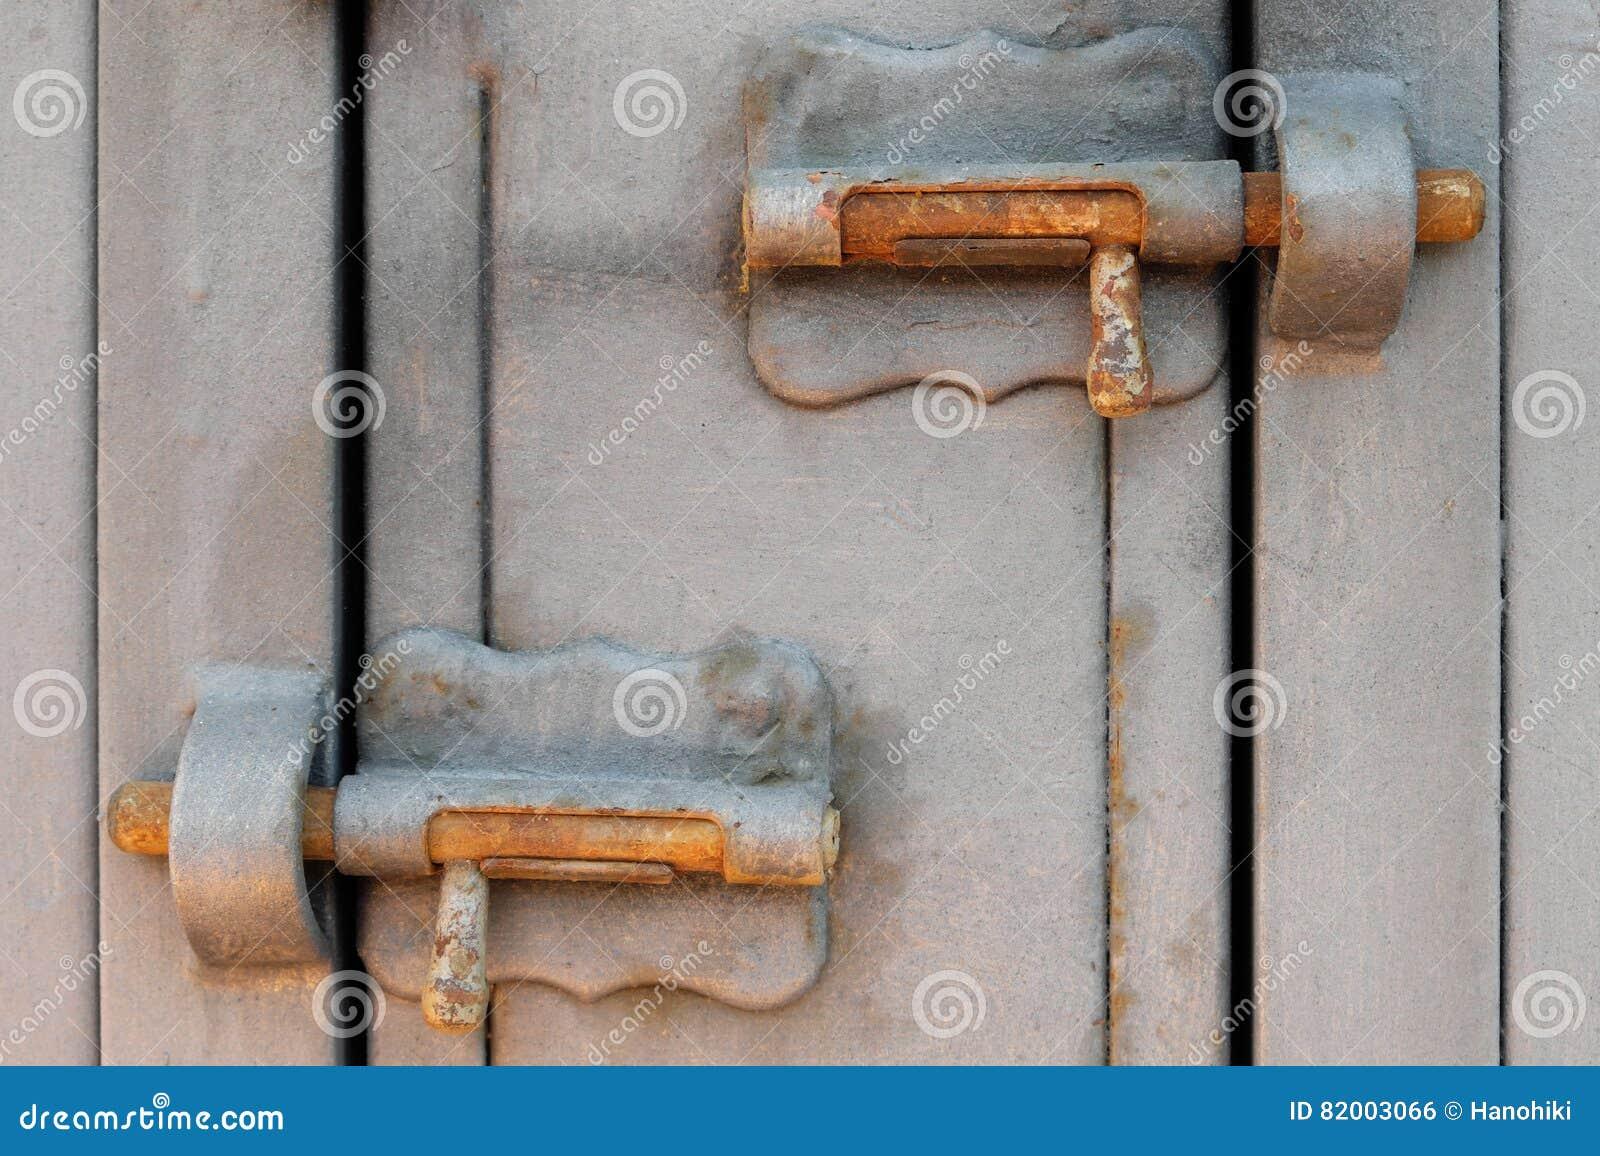 Verschlossene tür  Weinlesemetallklinke, Sperrbolzen, Verschlossene Tür Stockfoto ...